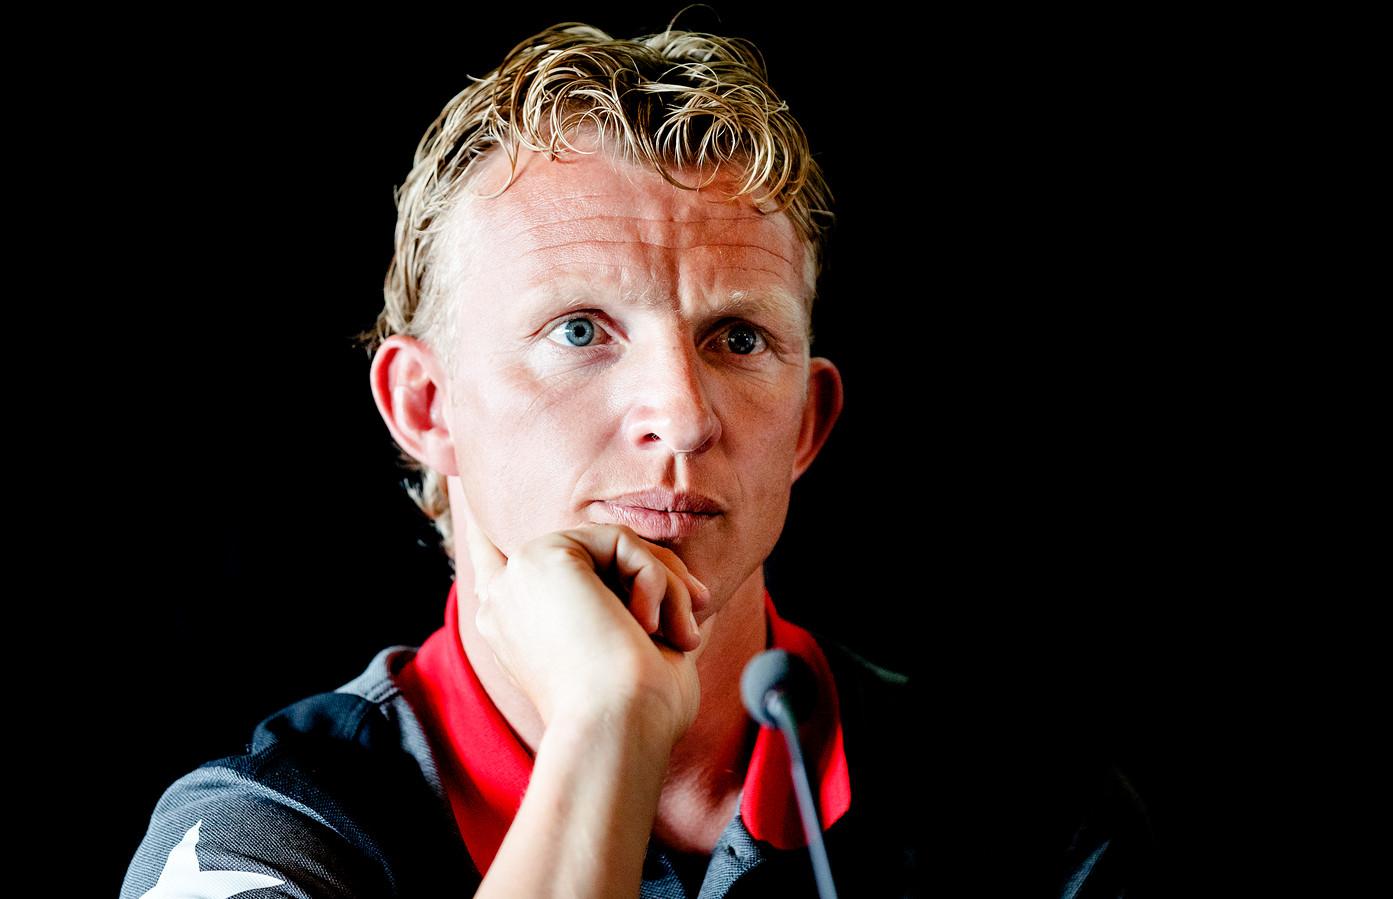 Dirk Kuyt.